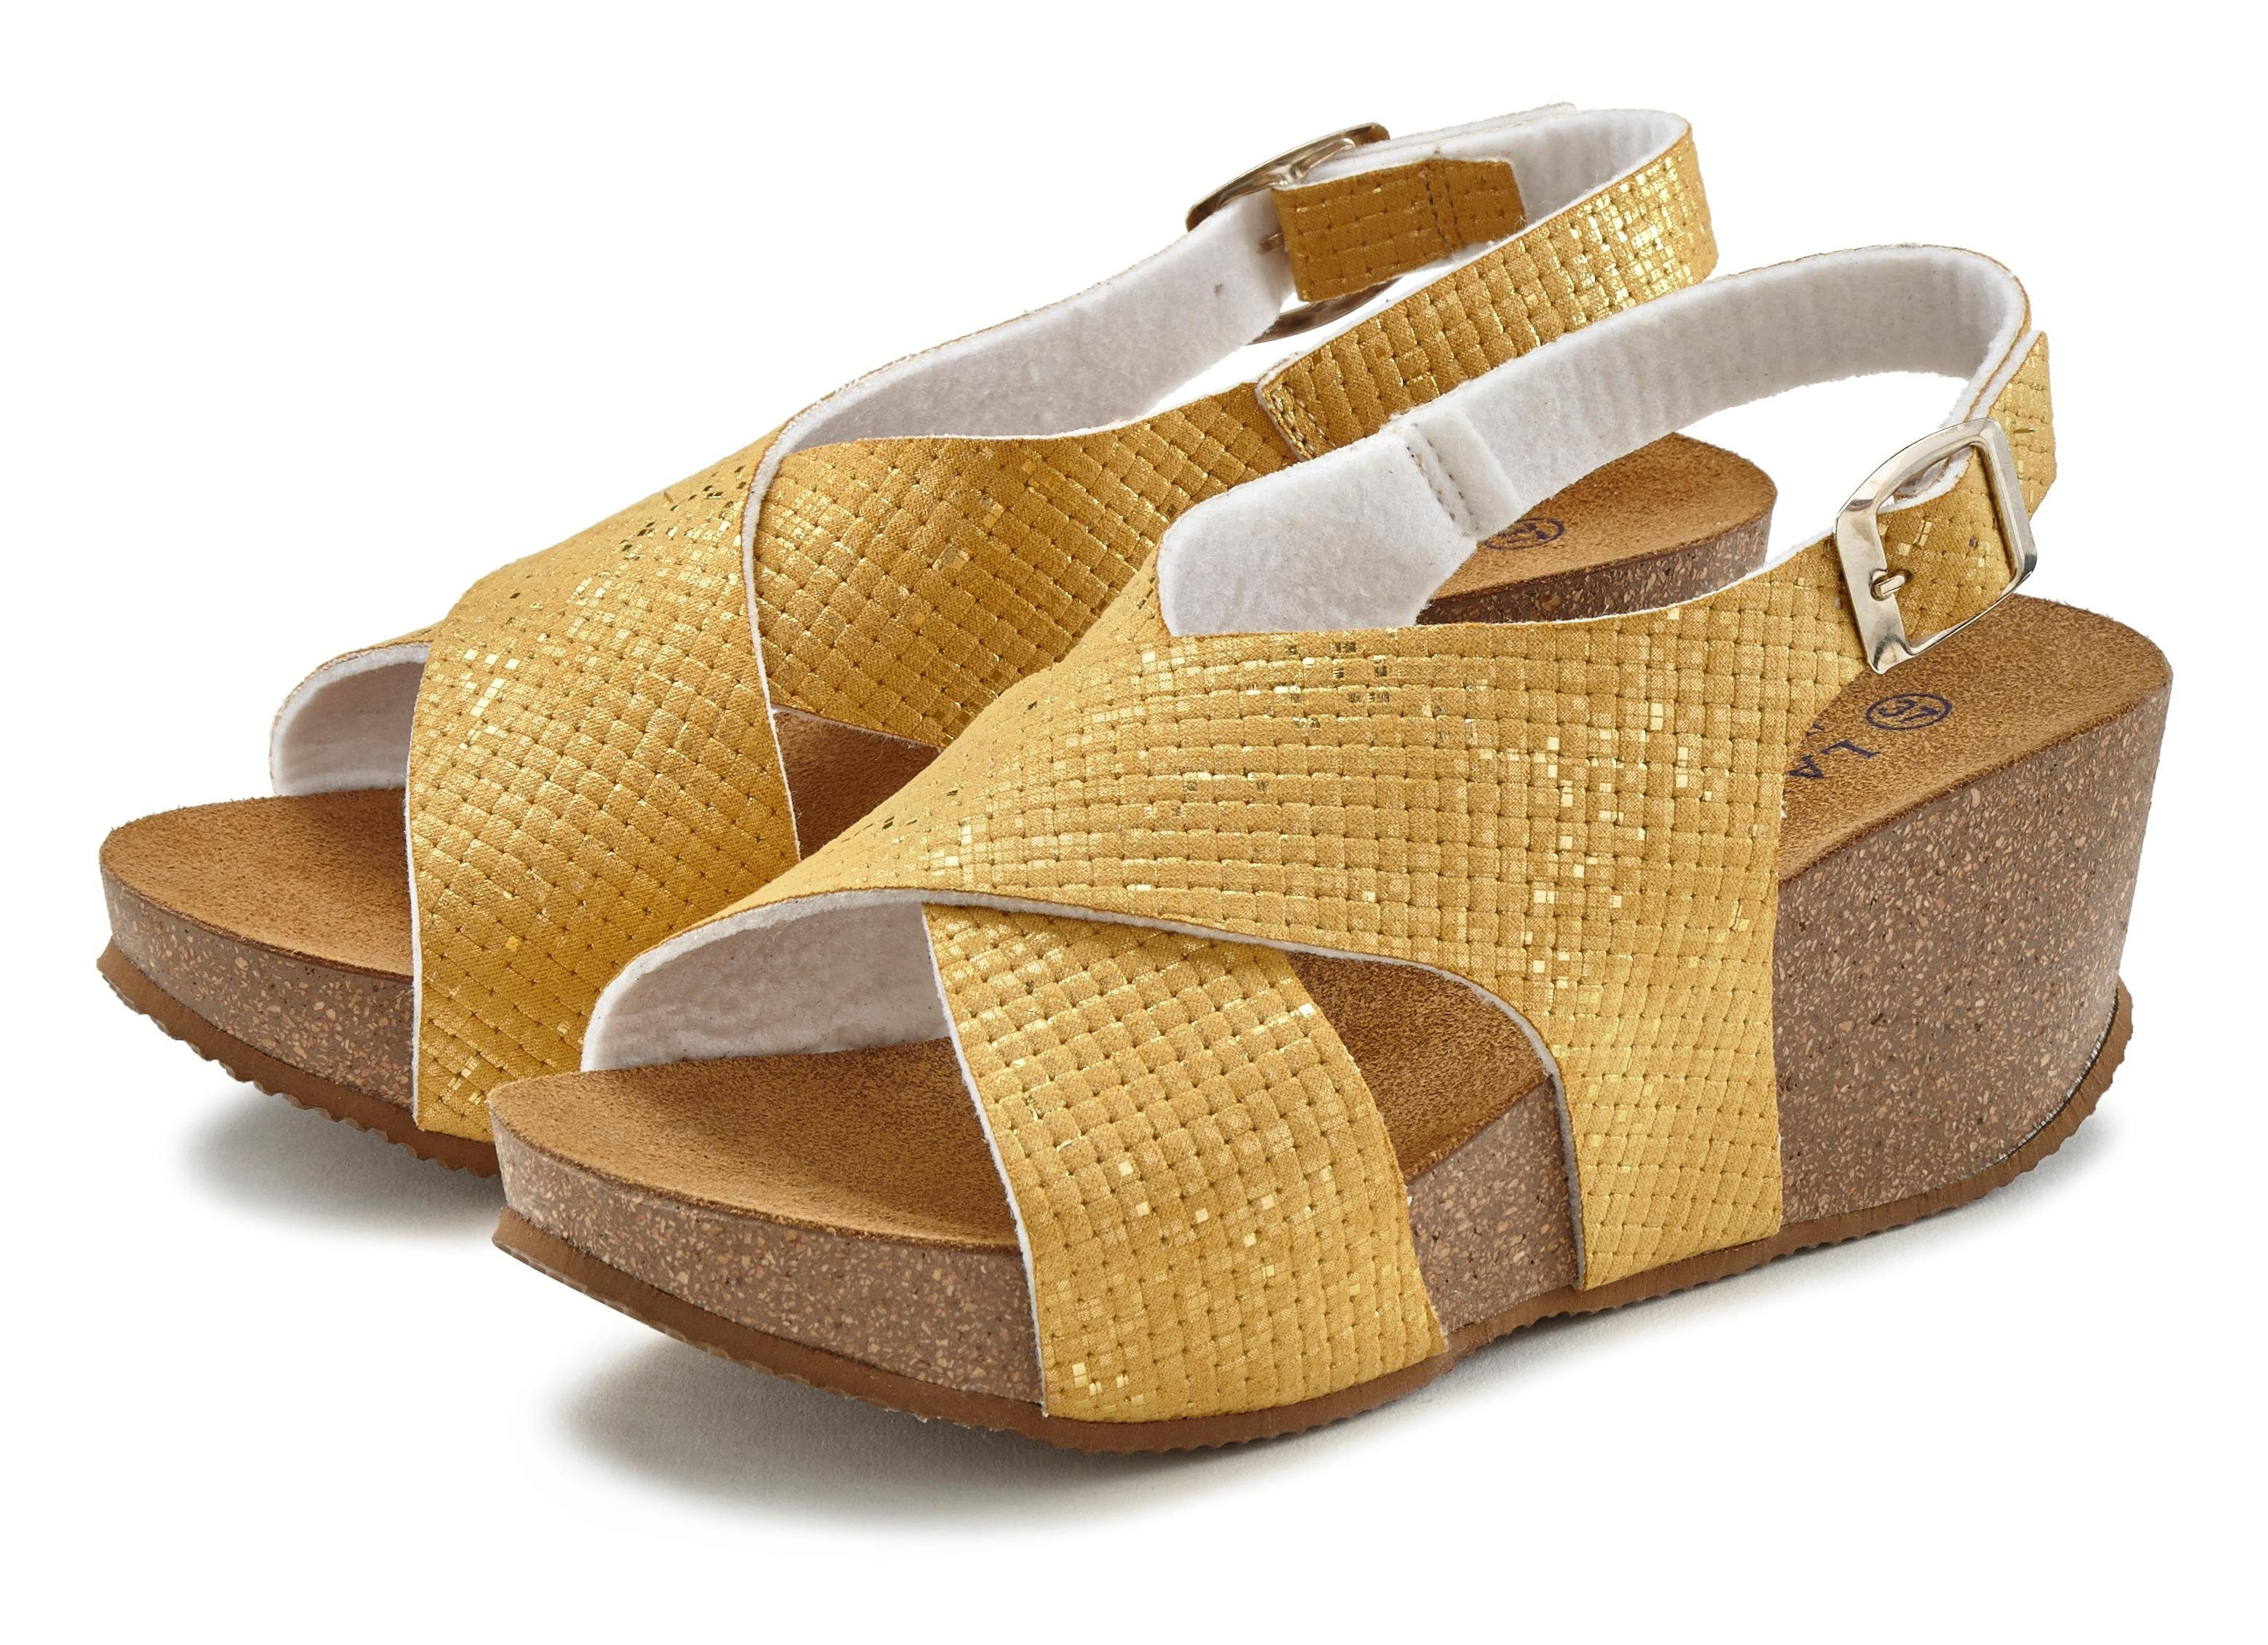 40 ARIZONA Damen Schuhe Sandaletten Sandalette Sandalen Keilabsatz Schwarz Gr